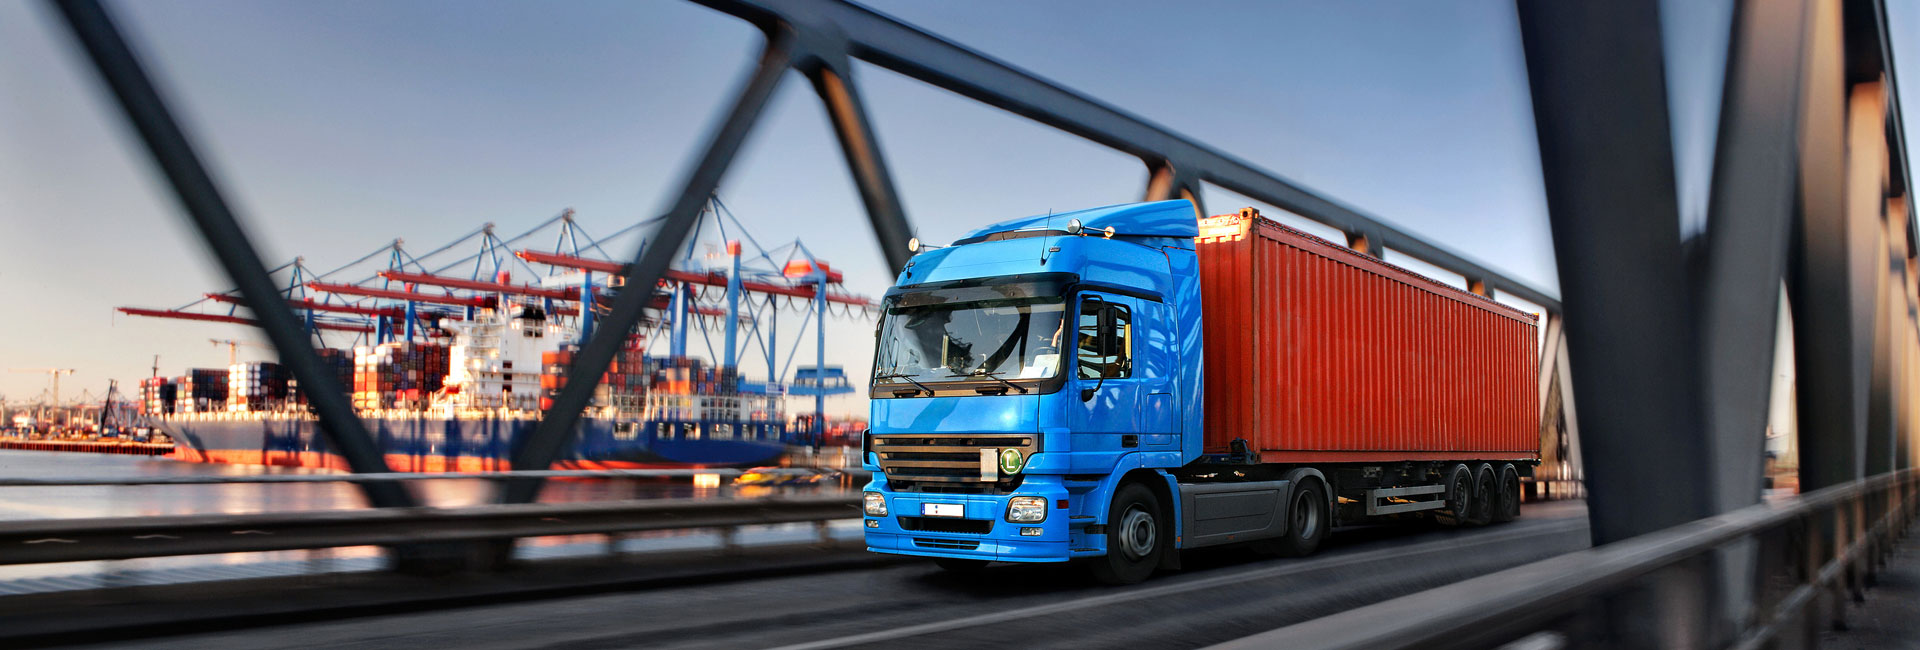 Chemikalien Online, Transporter Blau Orange